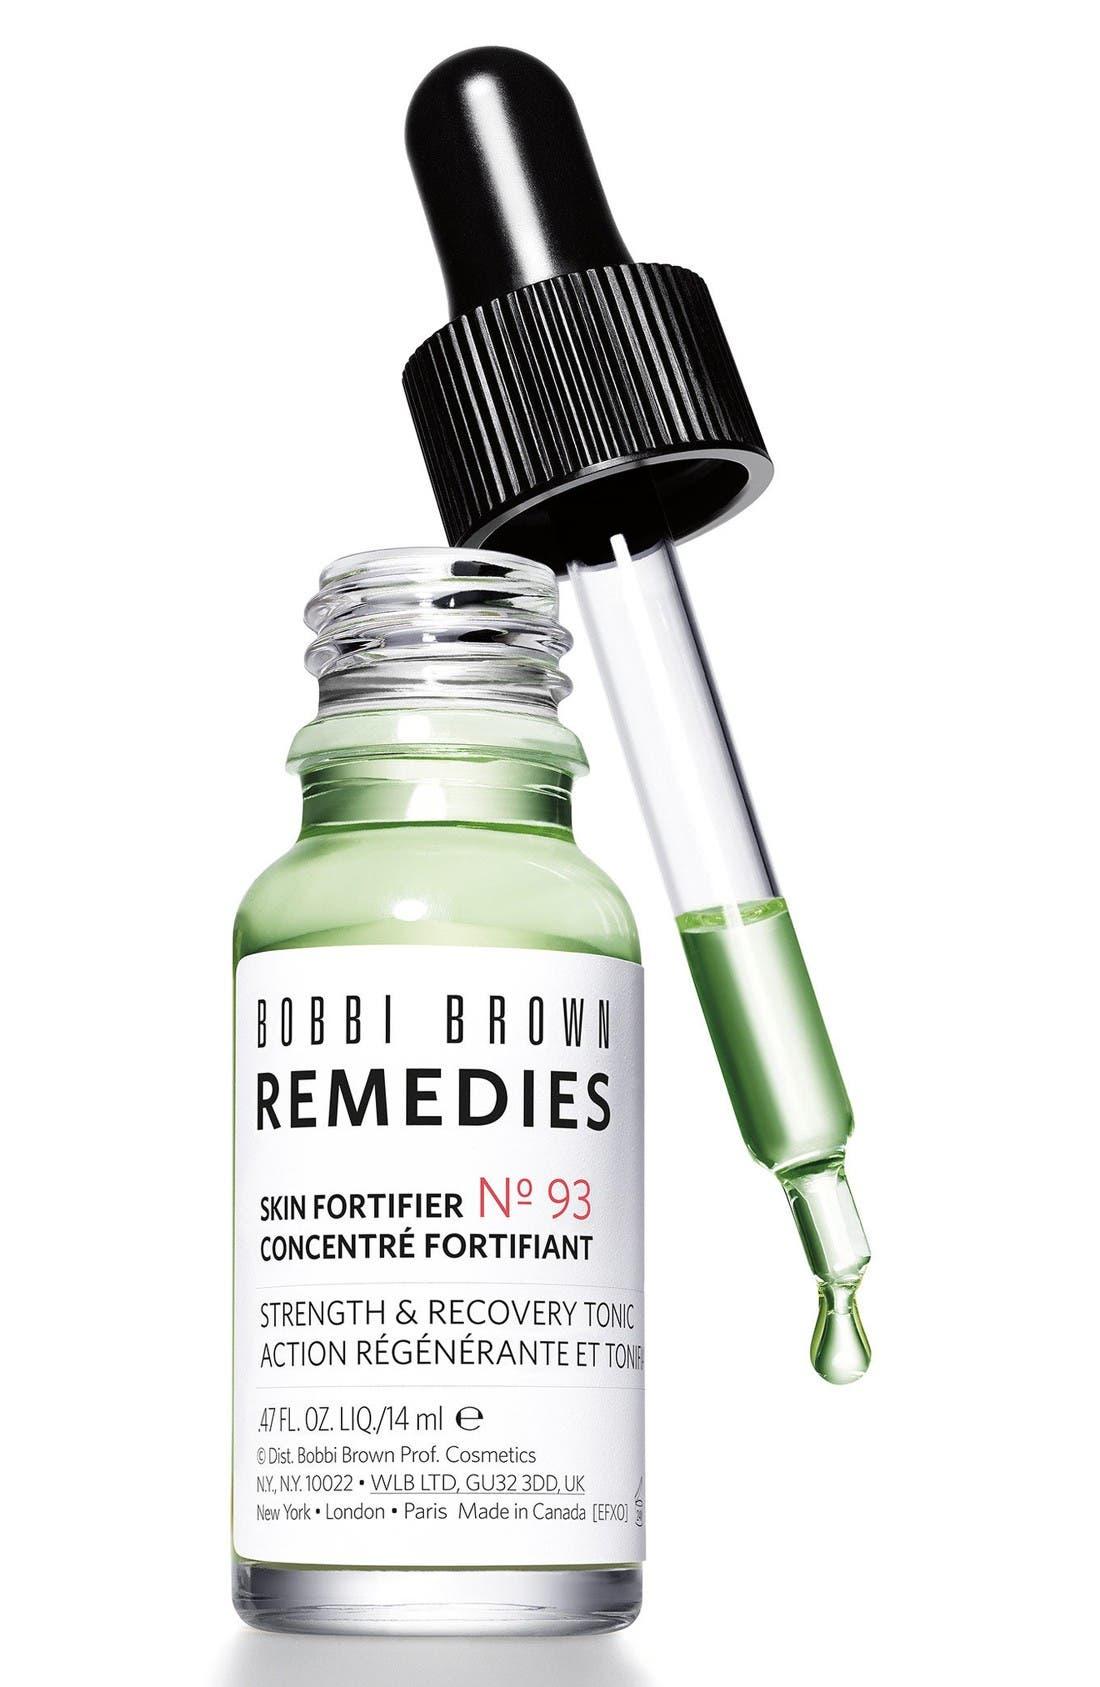 Bobbi Brown Remedies Skin Fortifier Strength & Recovery Tonic